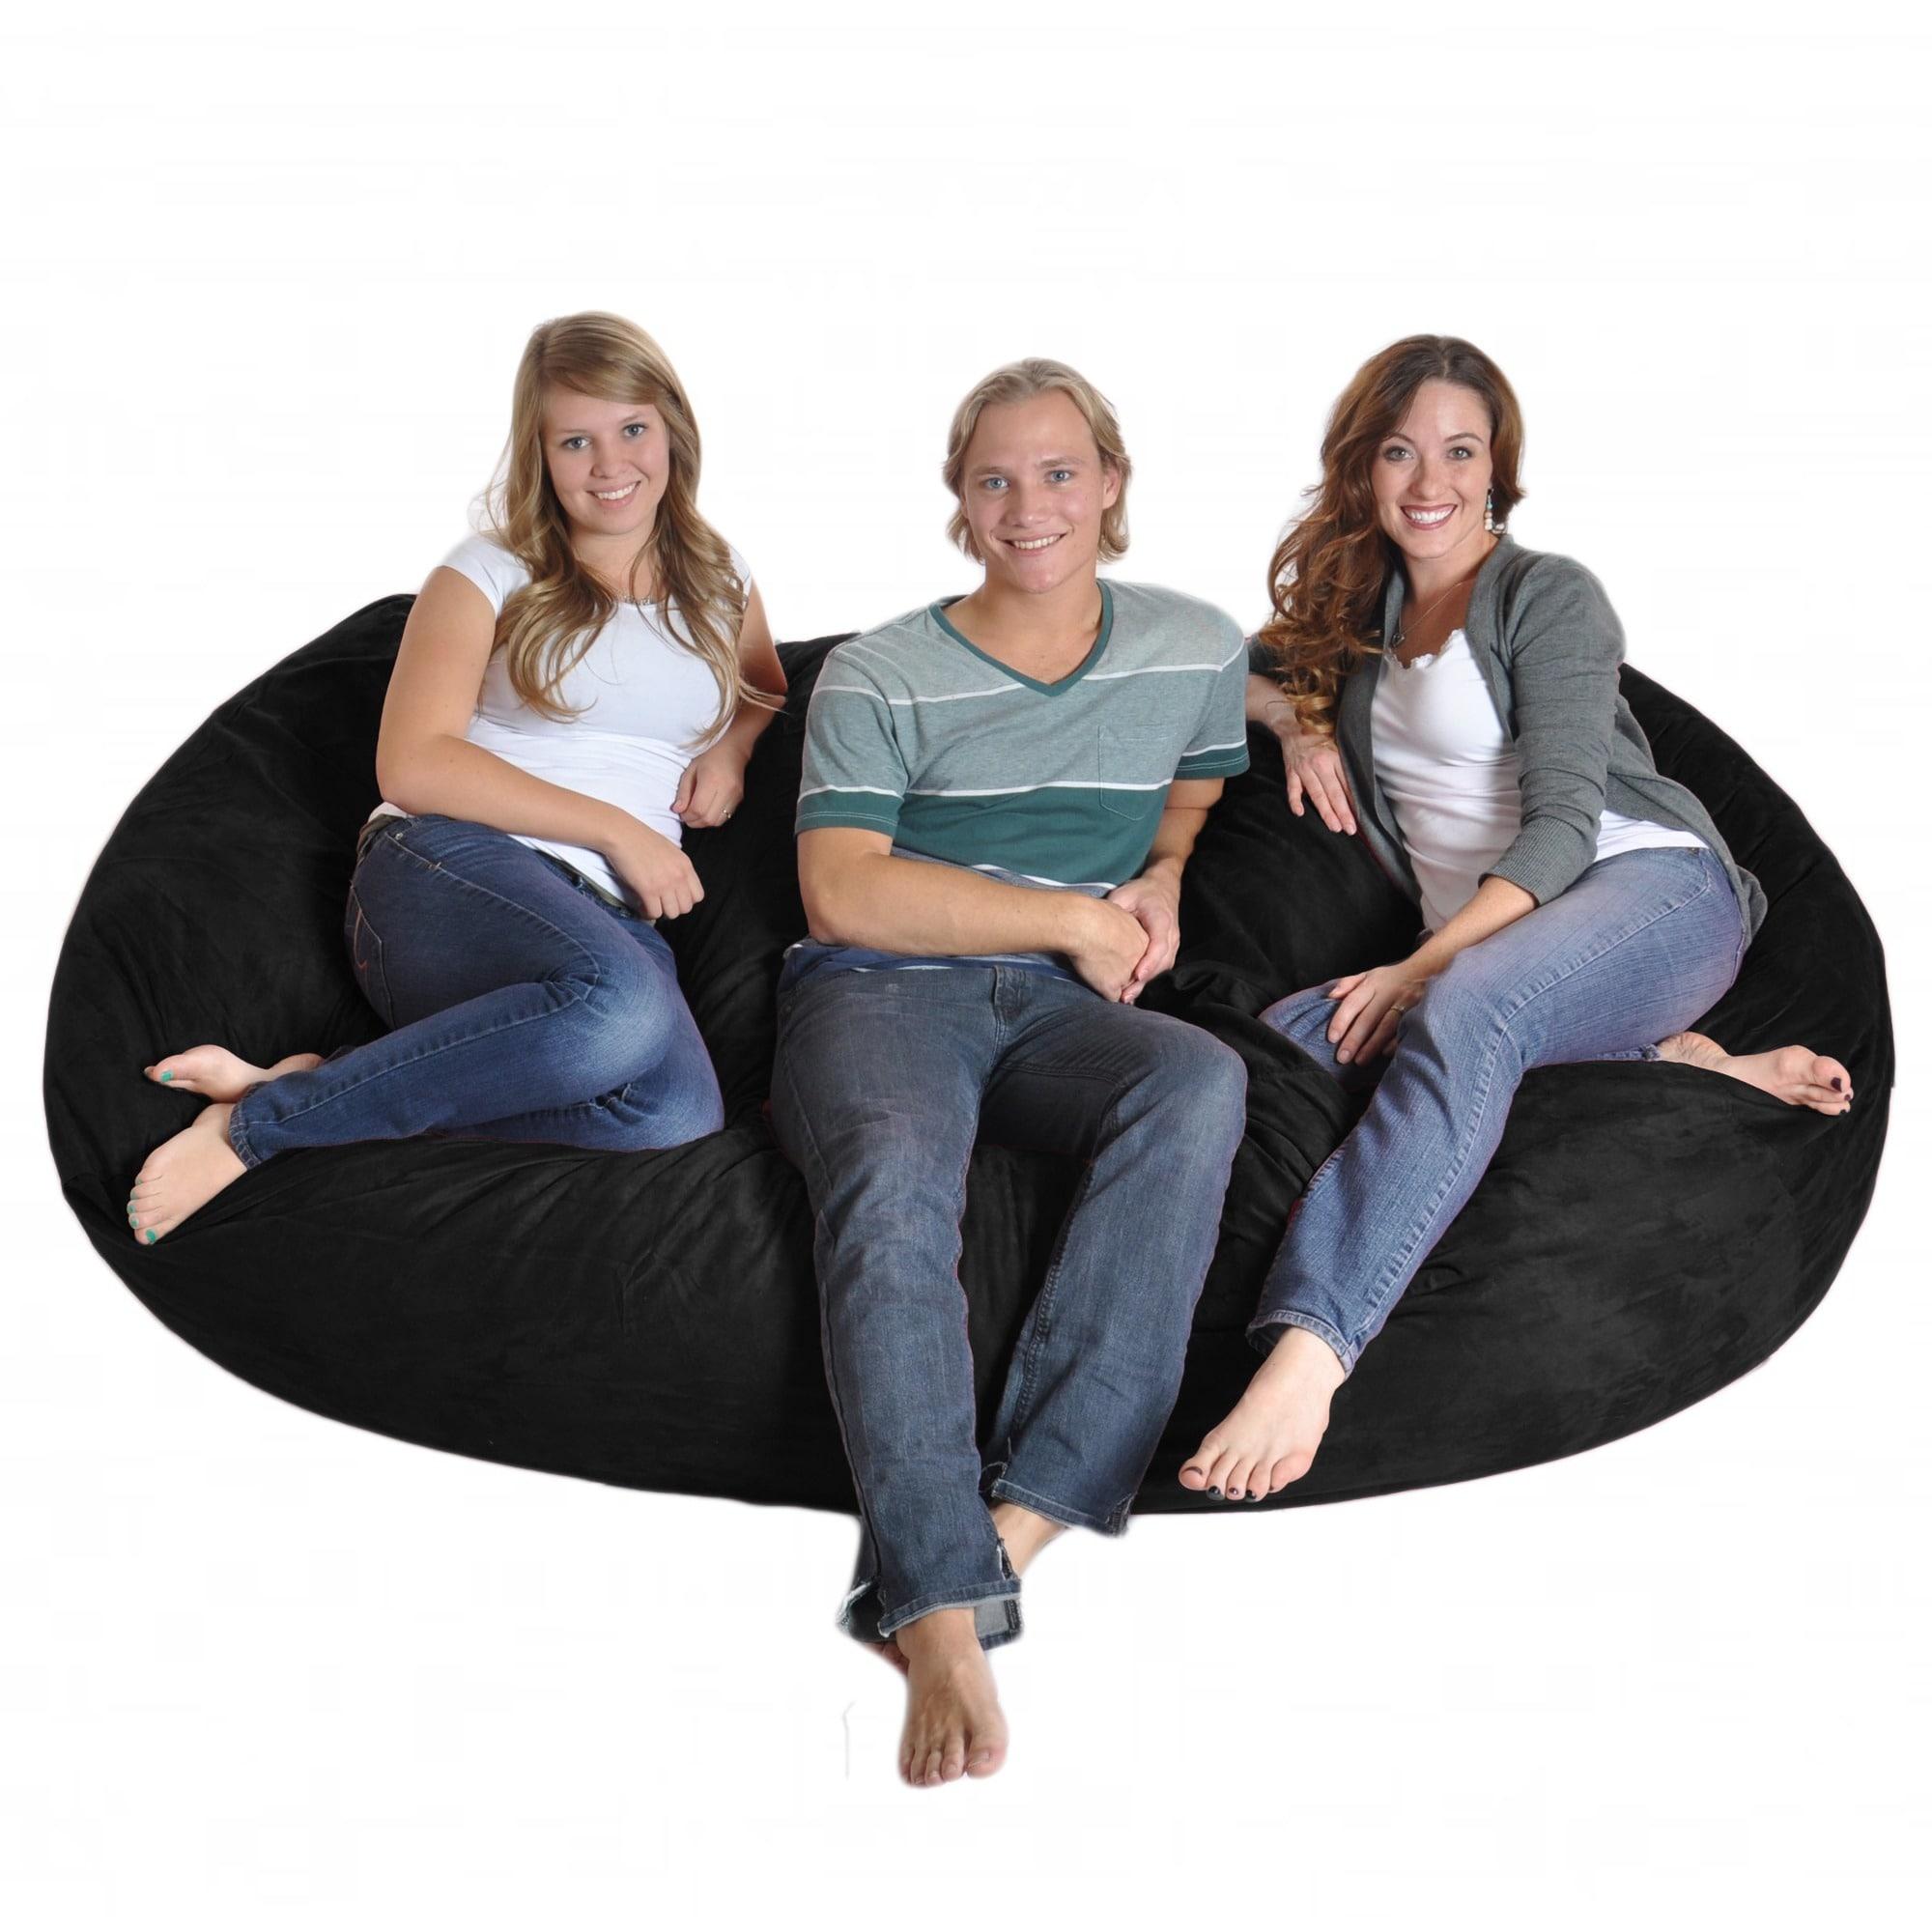 Superb Black Microfiber And Memory Foam Bean Bag Chair 8 Oval Short Links Chair Design For Home Short Linksinfo